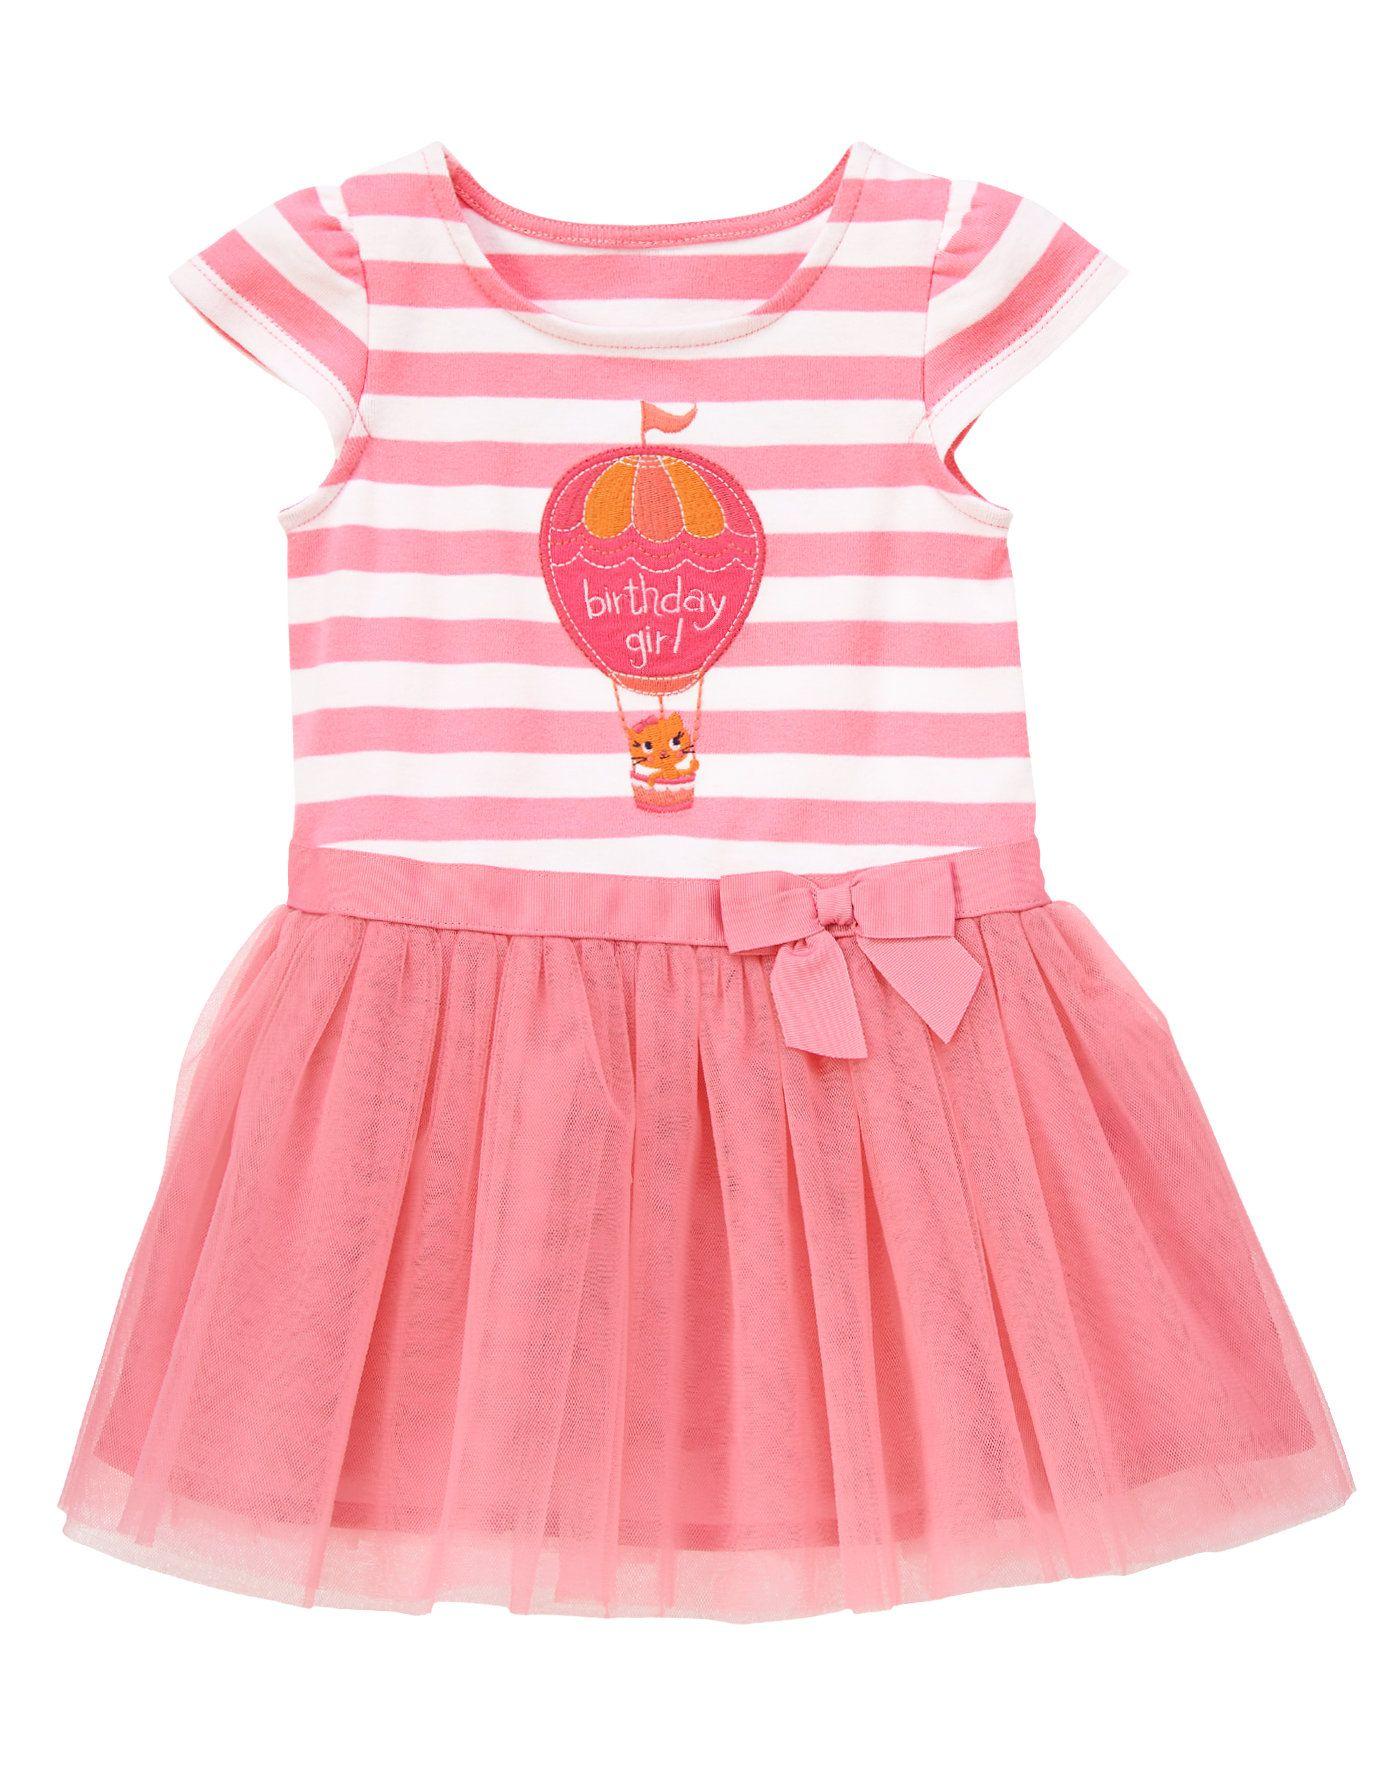 Birthday Girl Dress at Gymboree   Kids   Pinterest   Vestidos de ...